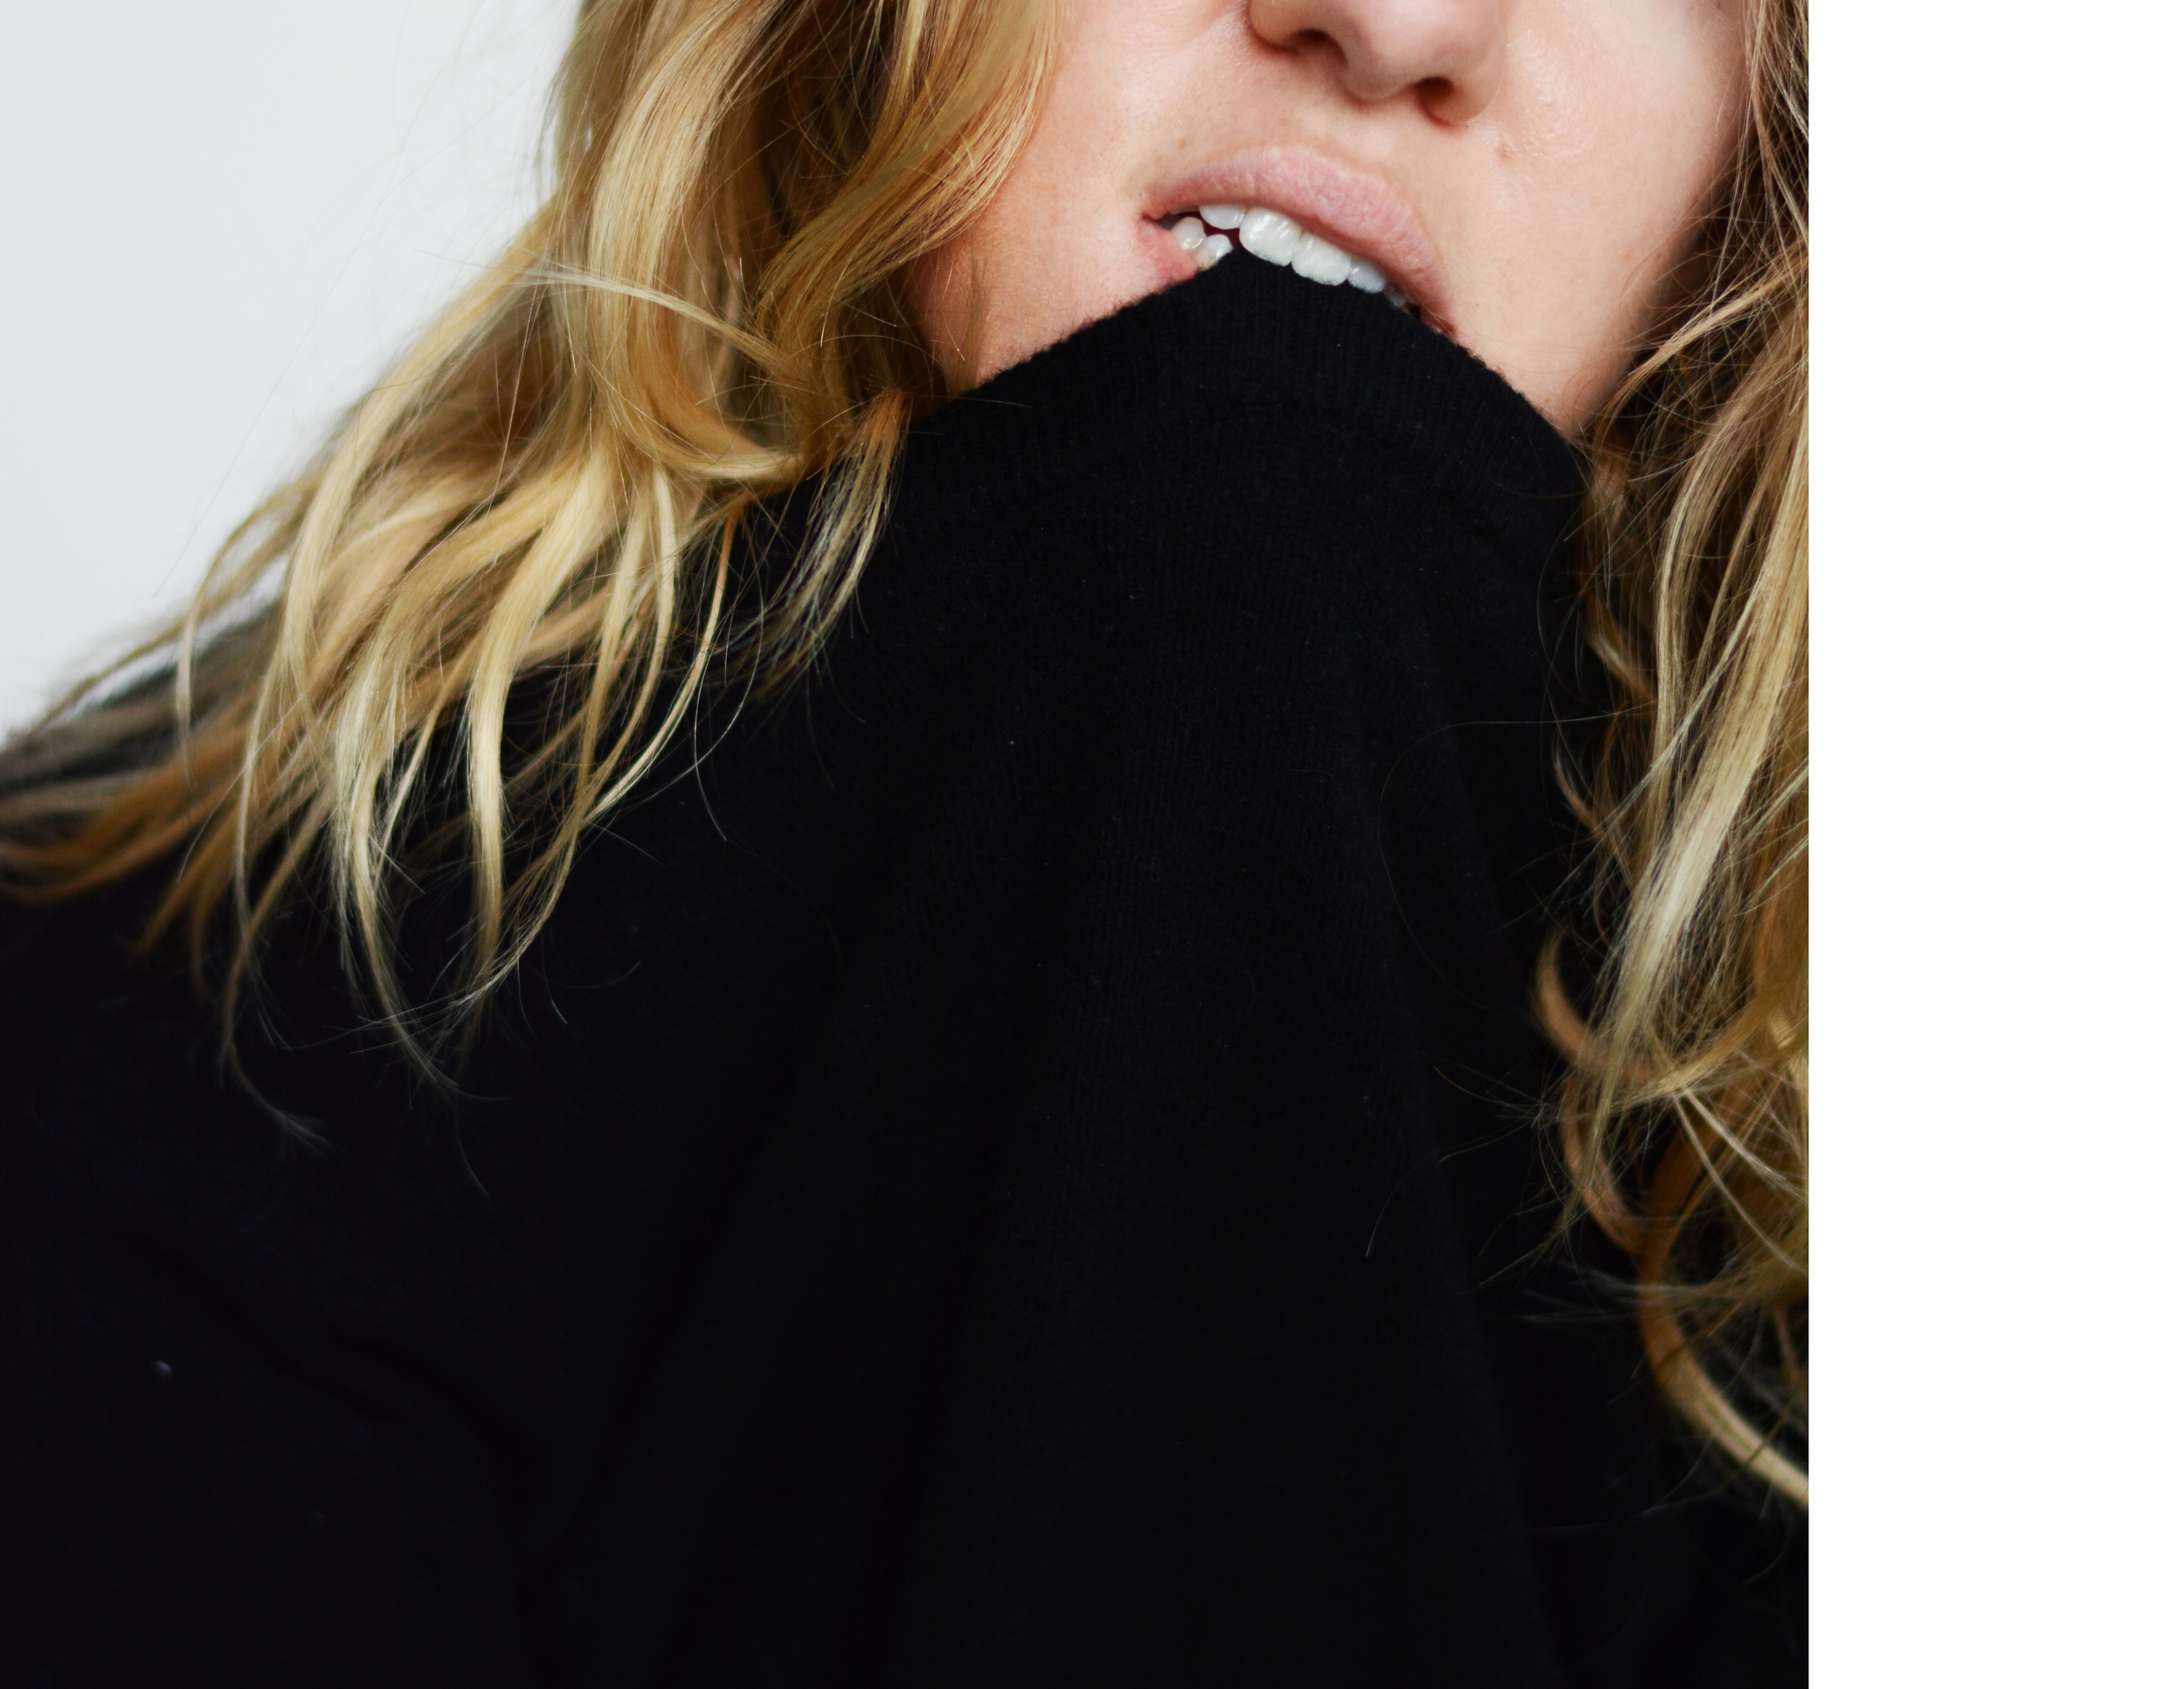 TaylrAnne-The-Sept-Cashmere-Minimal-7